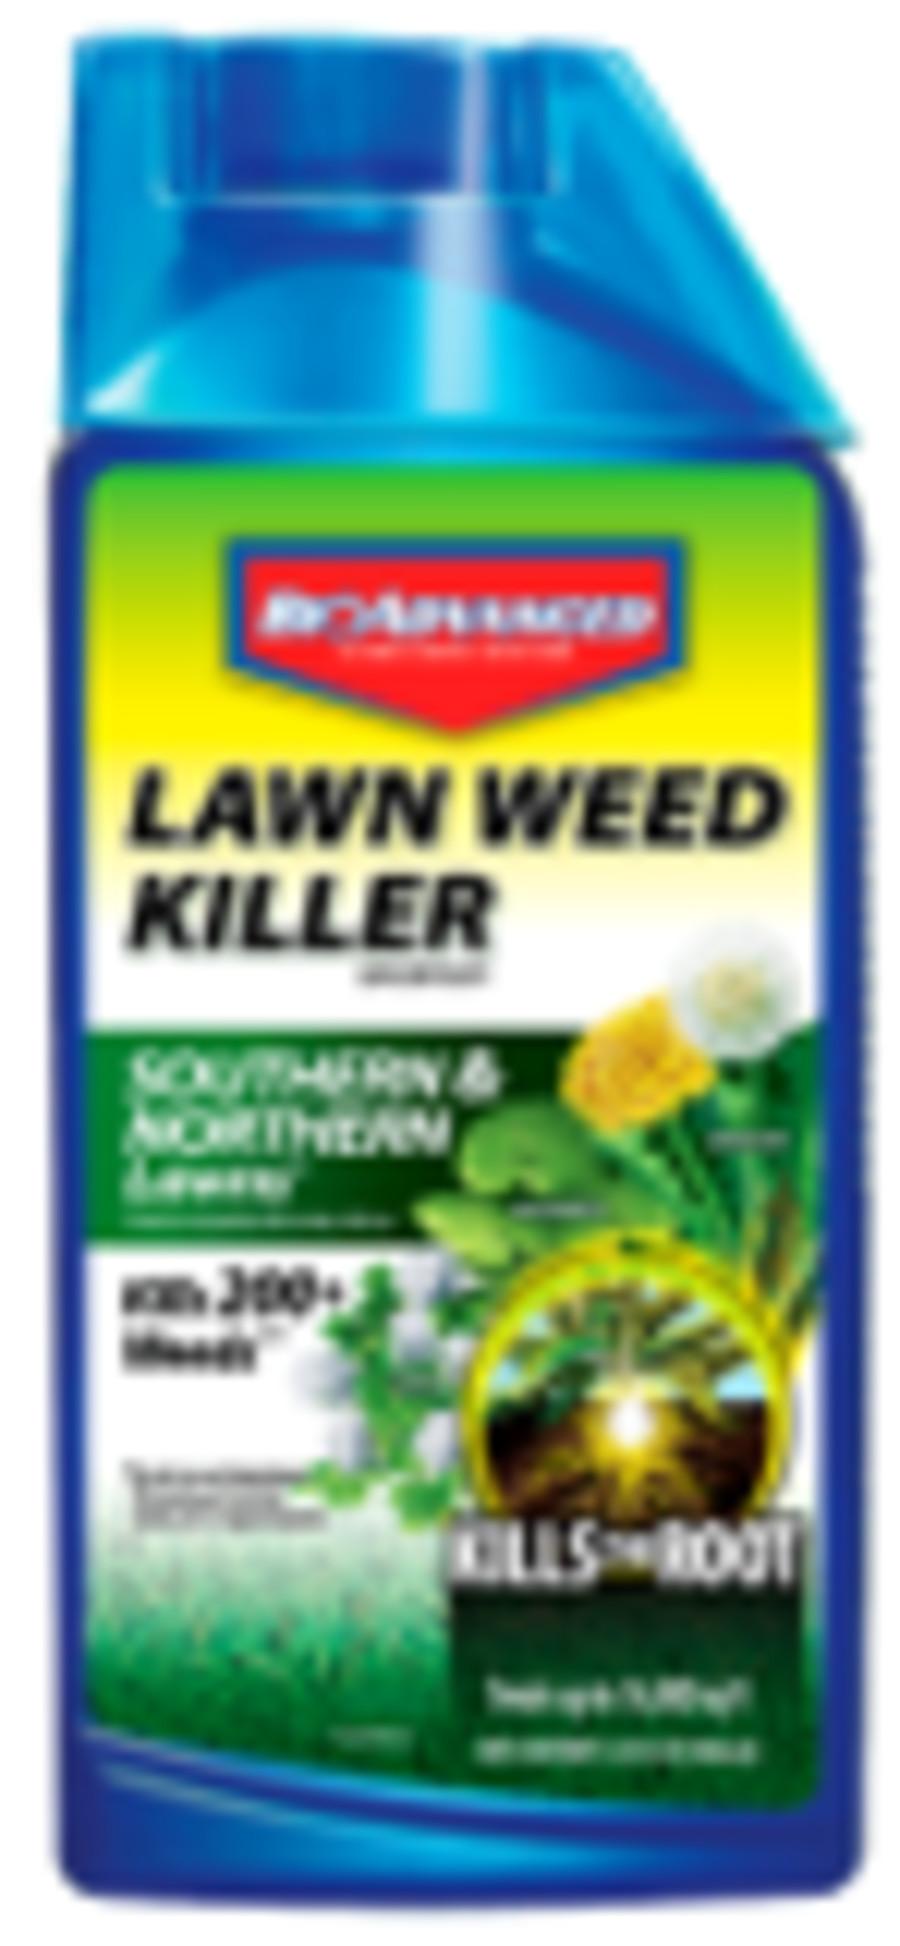 BioAdvanced Lawn Weed Killer South & North Lawn Concentrate 8ea/32 fl oz